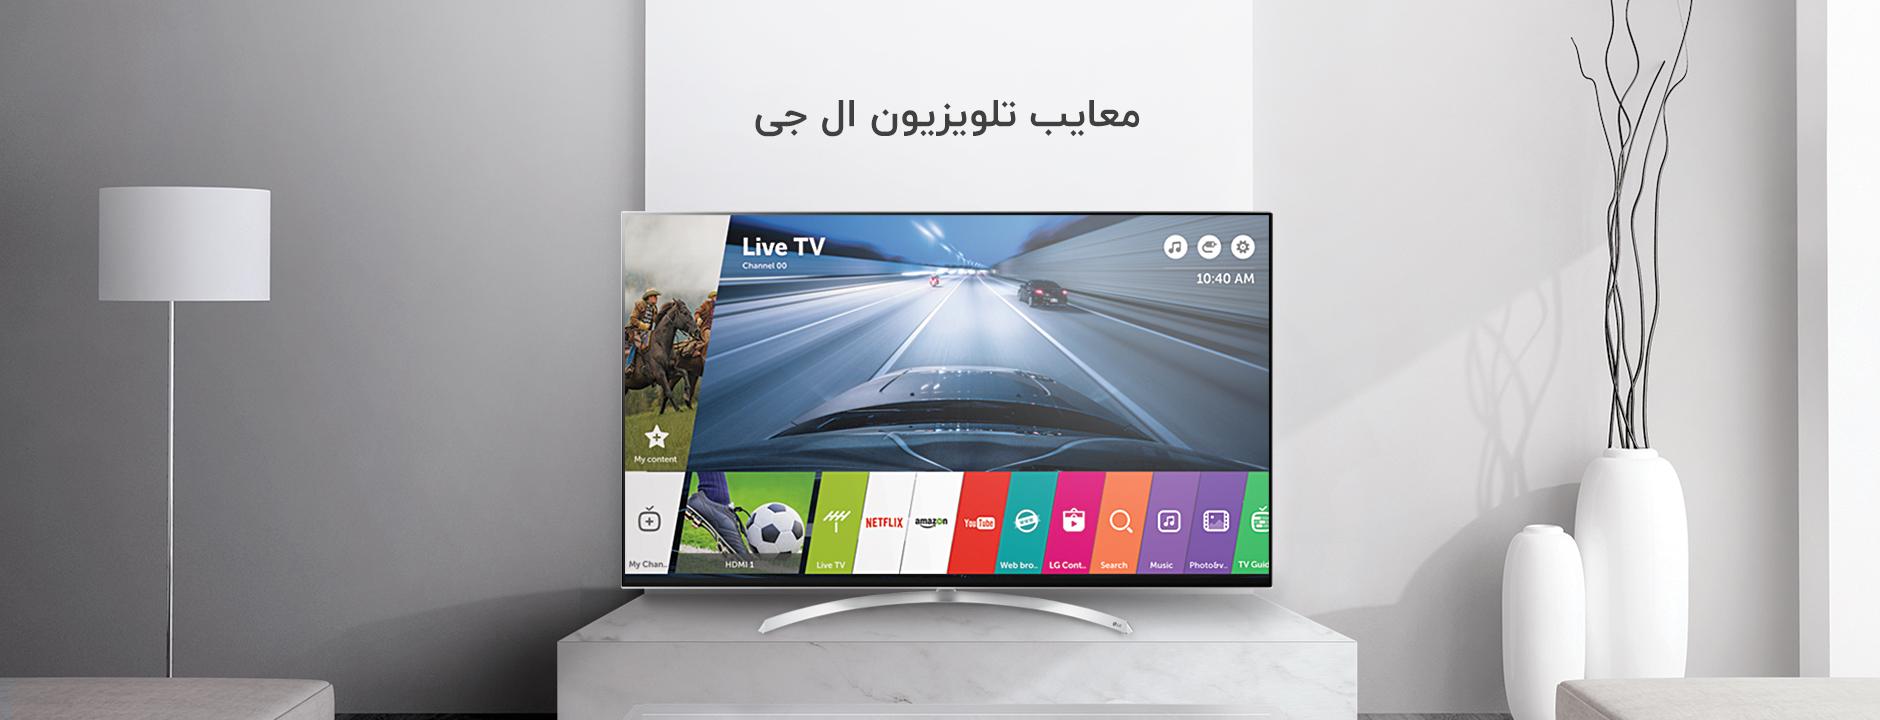 معایب تلویزیون ال جی